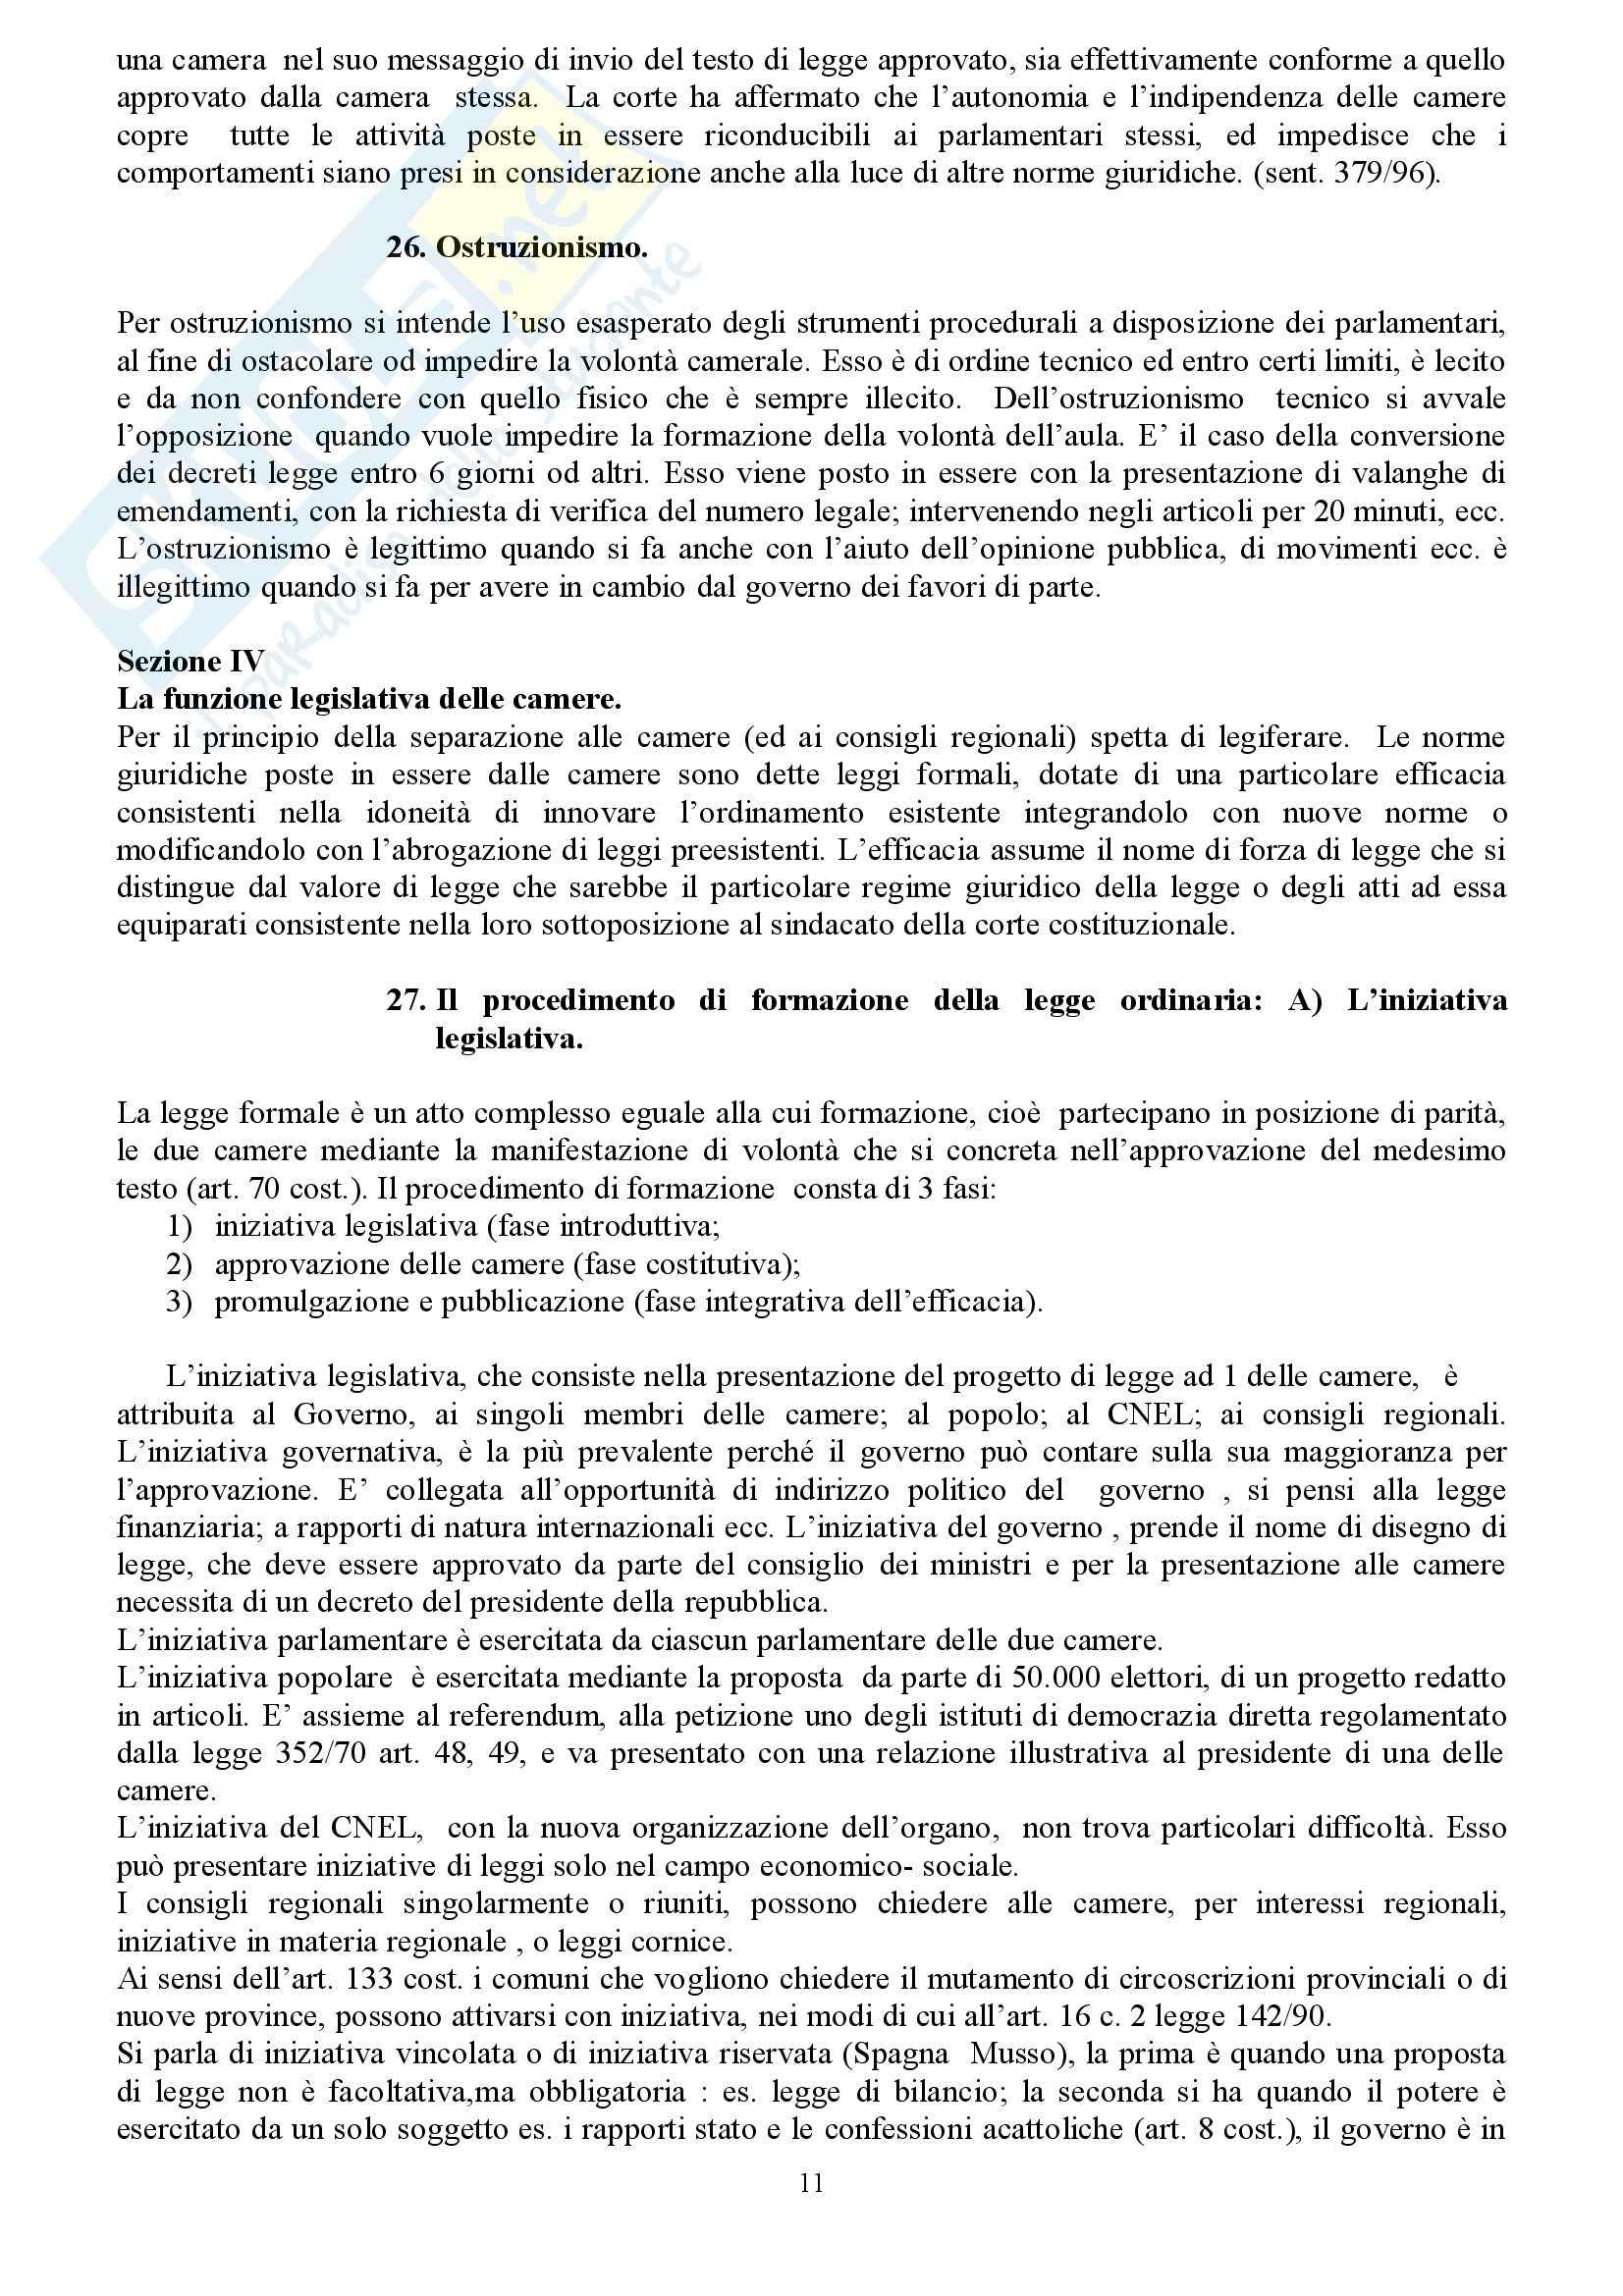 Riassunto esame Diritto Costituzionale, prof. indefinito, libro consigliato Diritto Costituzionale, Martines Pag. 11